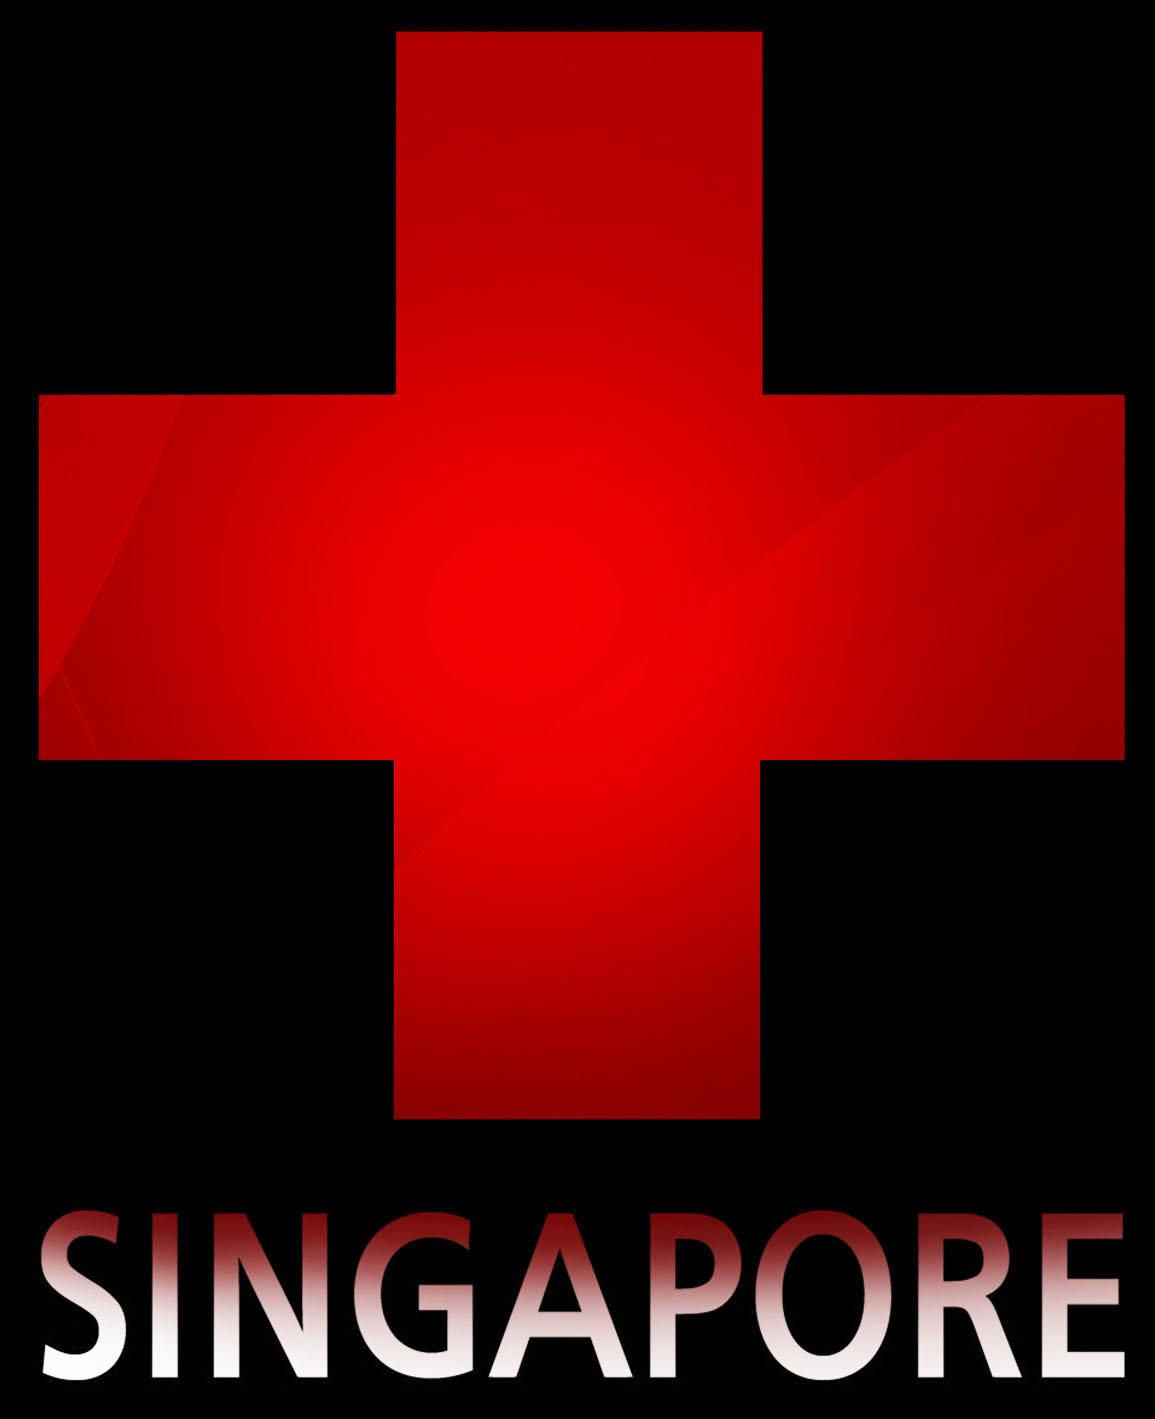 REDCROSS_Singapore